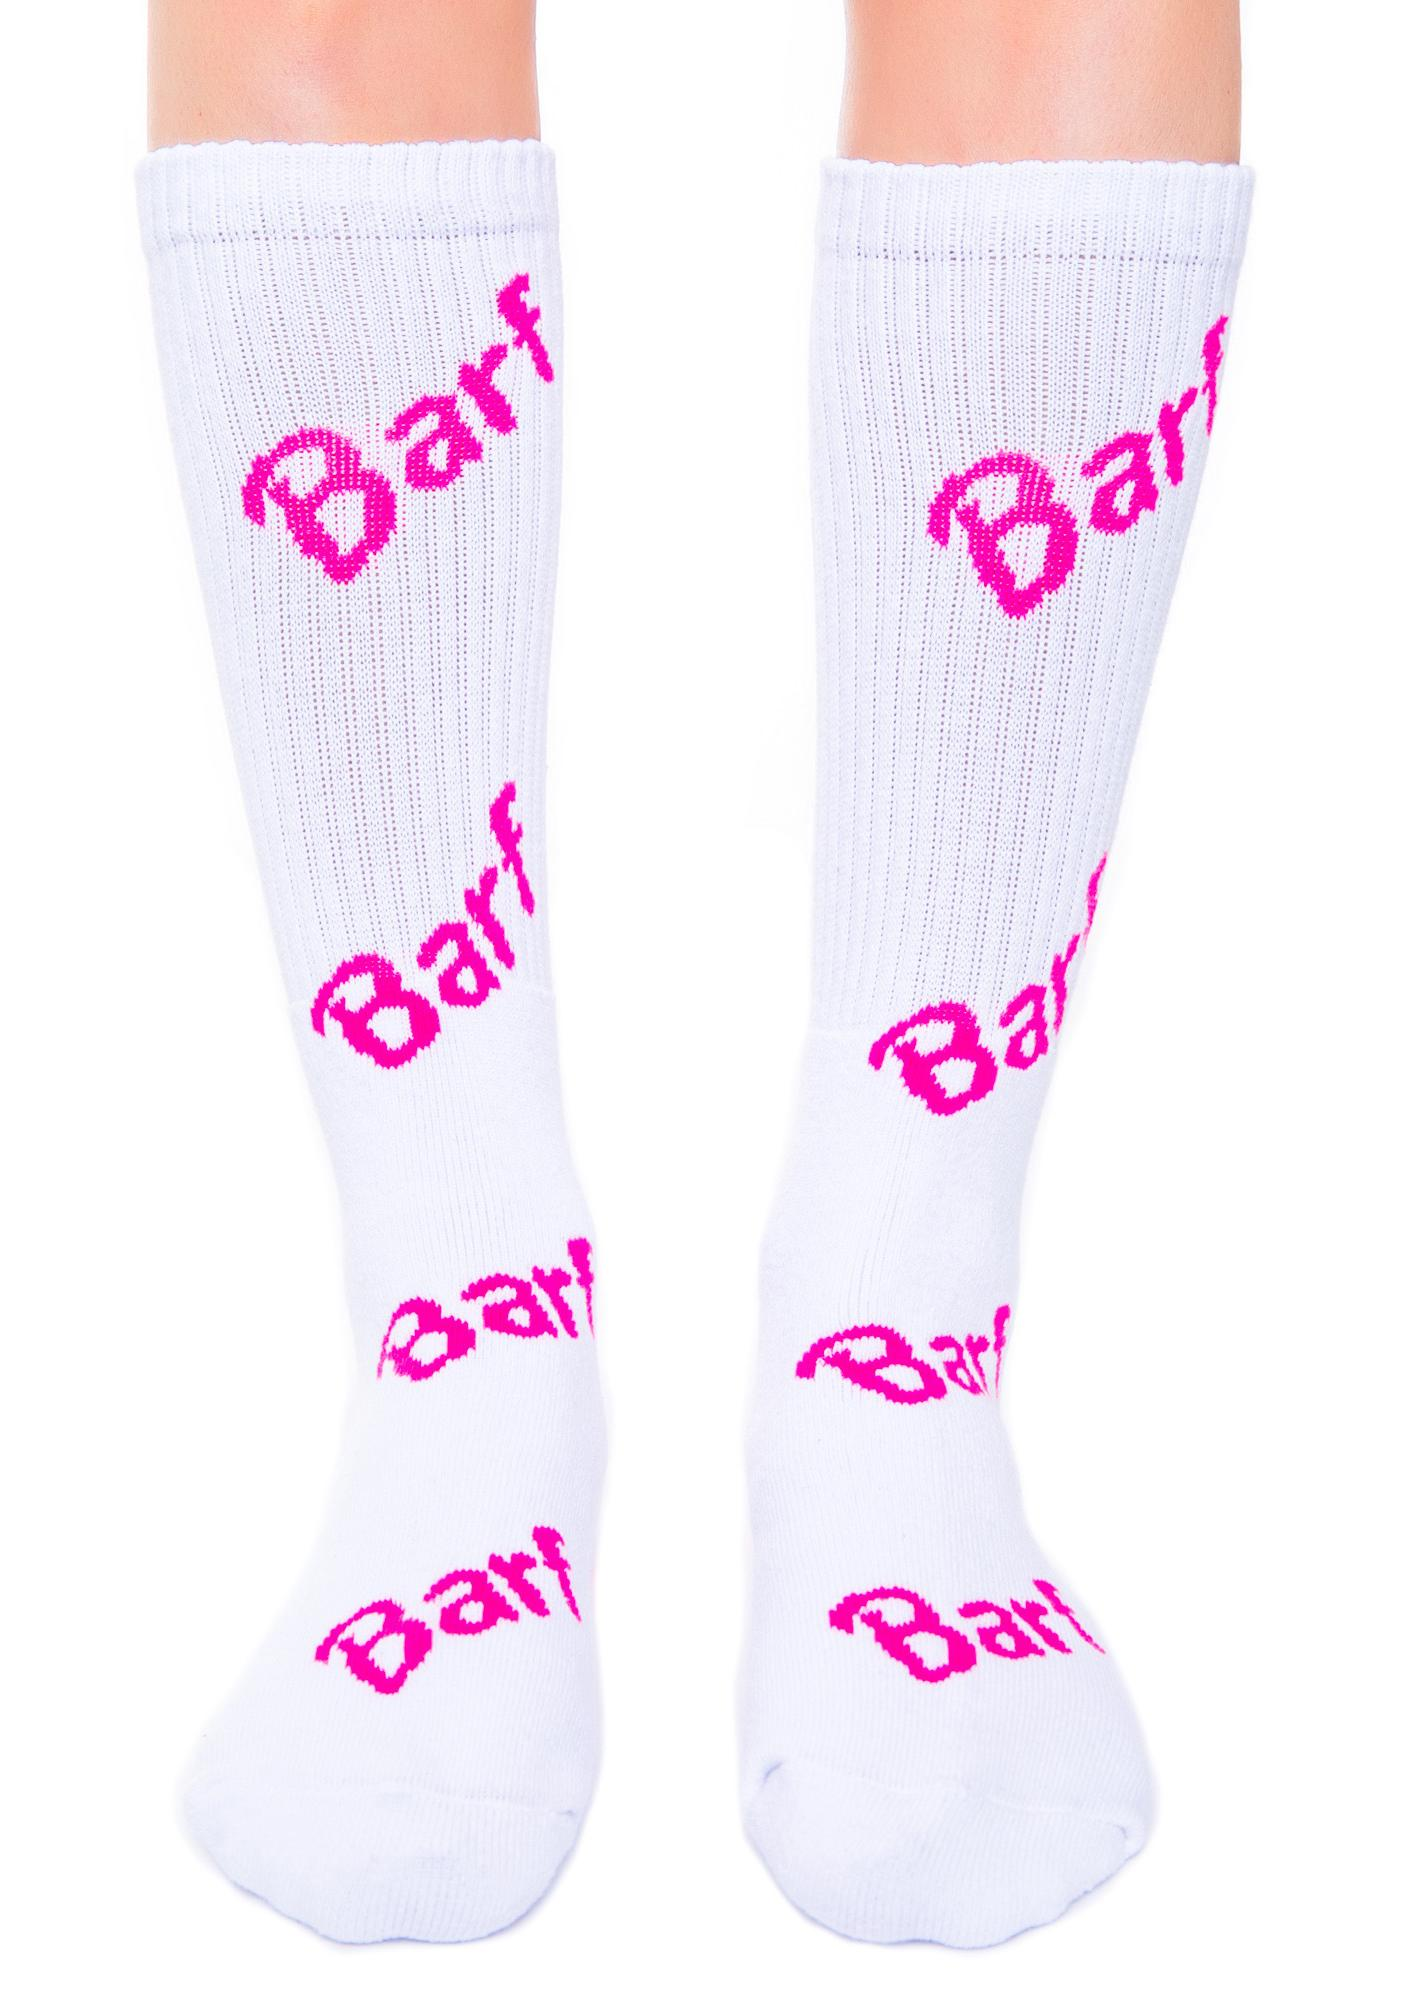 Petals and Peacocks Barf Socks